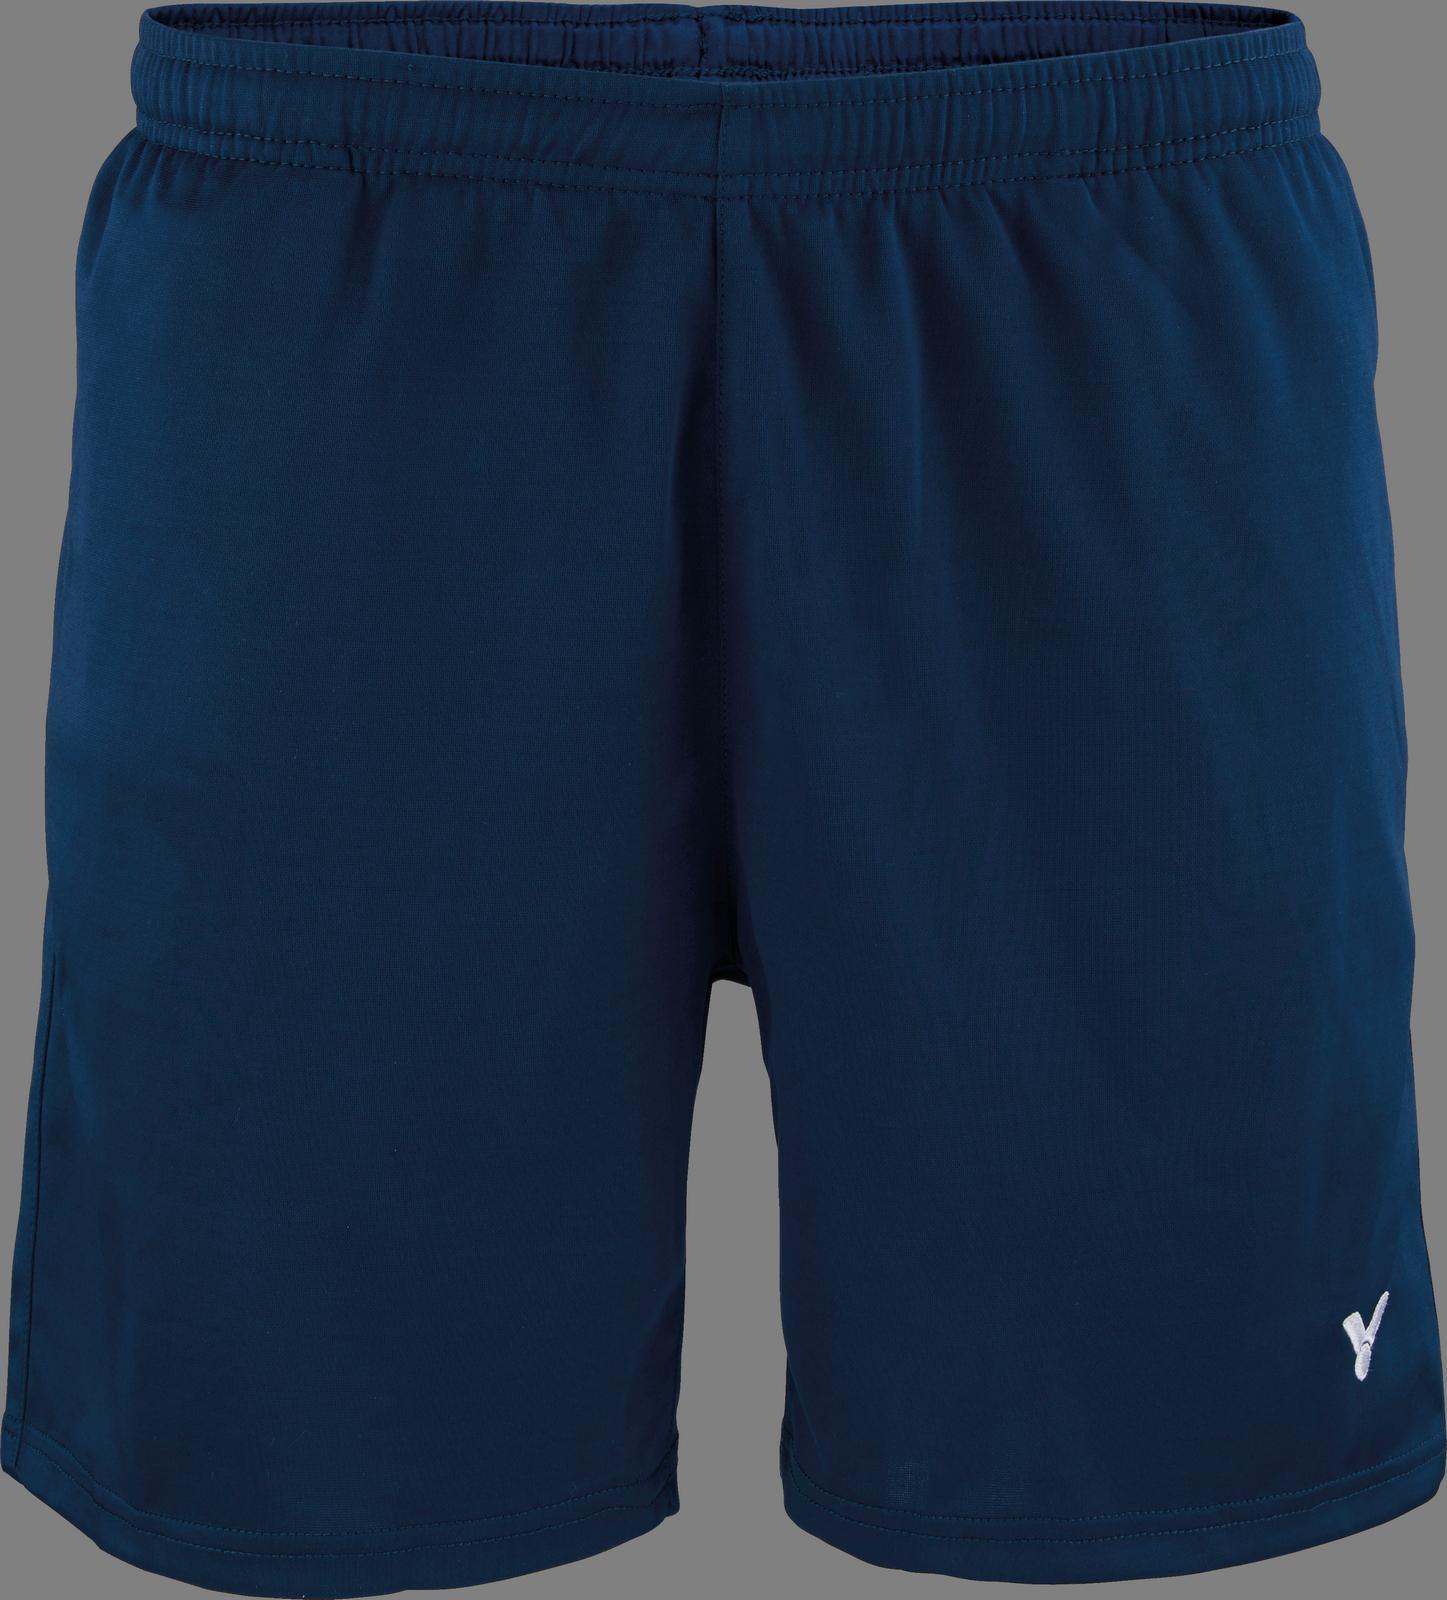 VICTOR Short Function 4866 blau